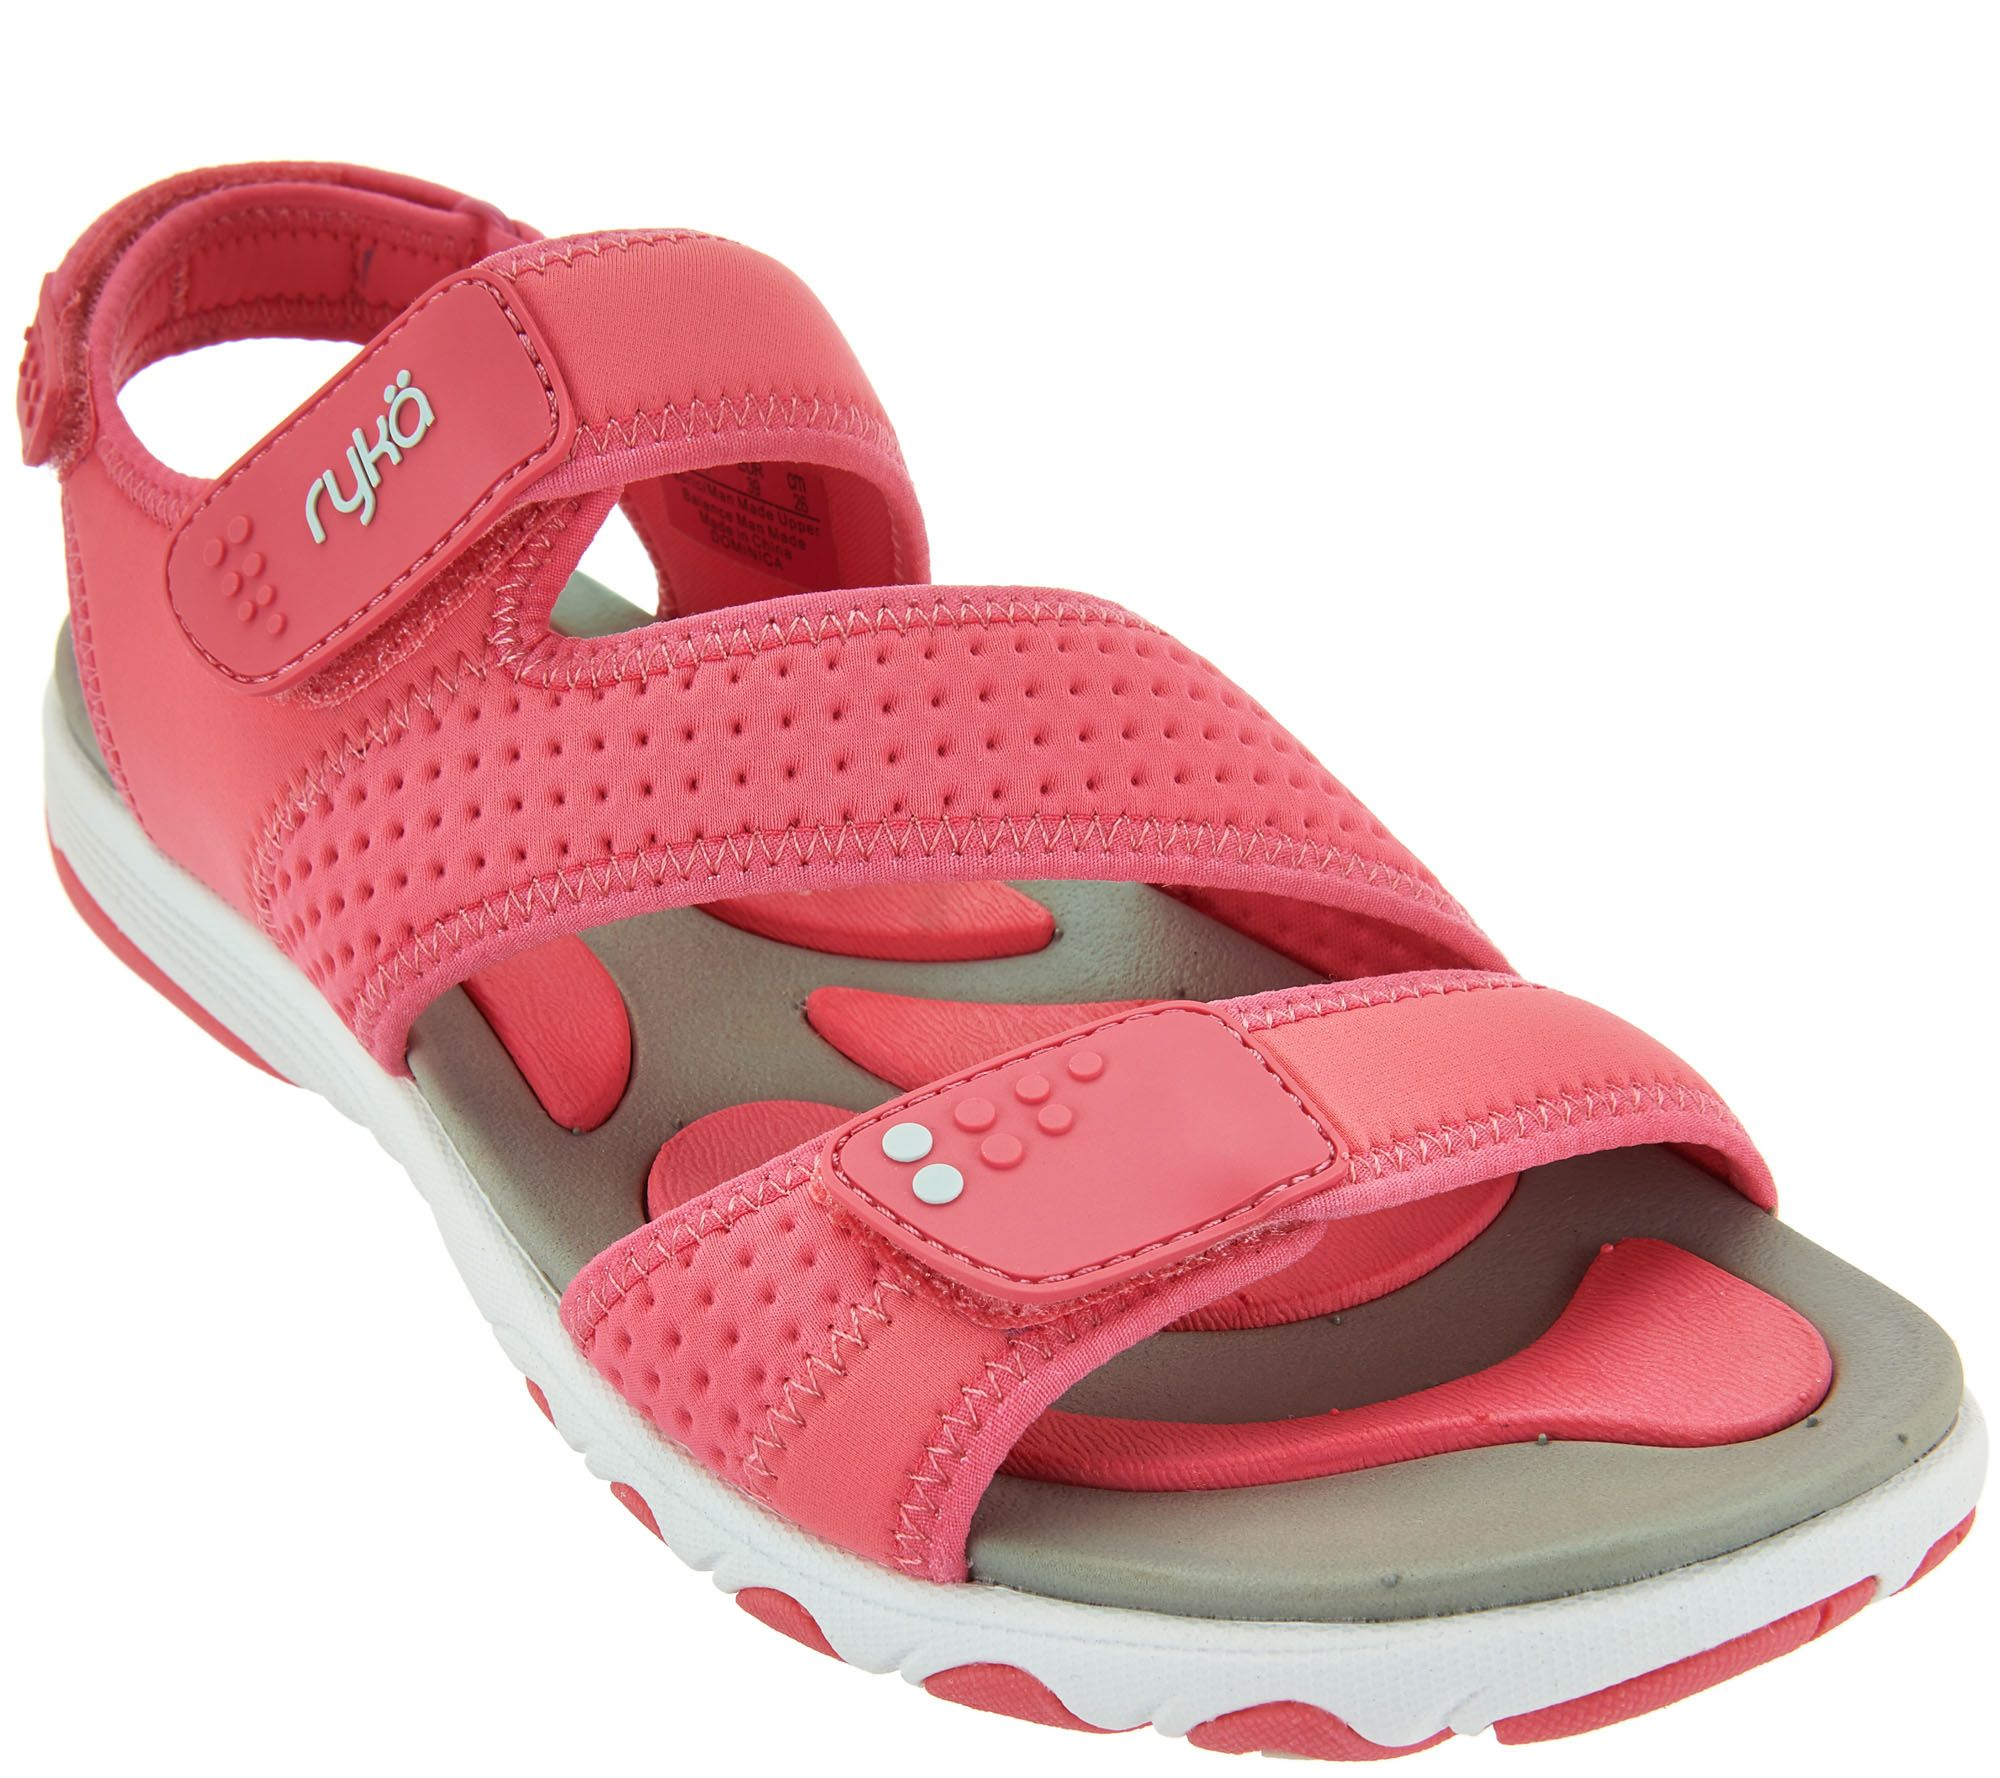 Ryka — Womens Sneakers Walking Shoes & Sandals — QVC